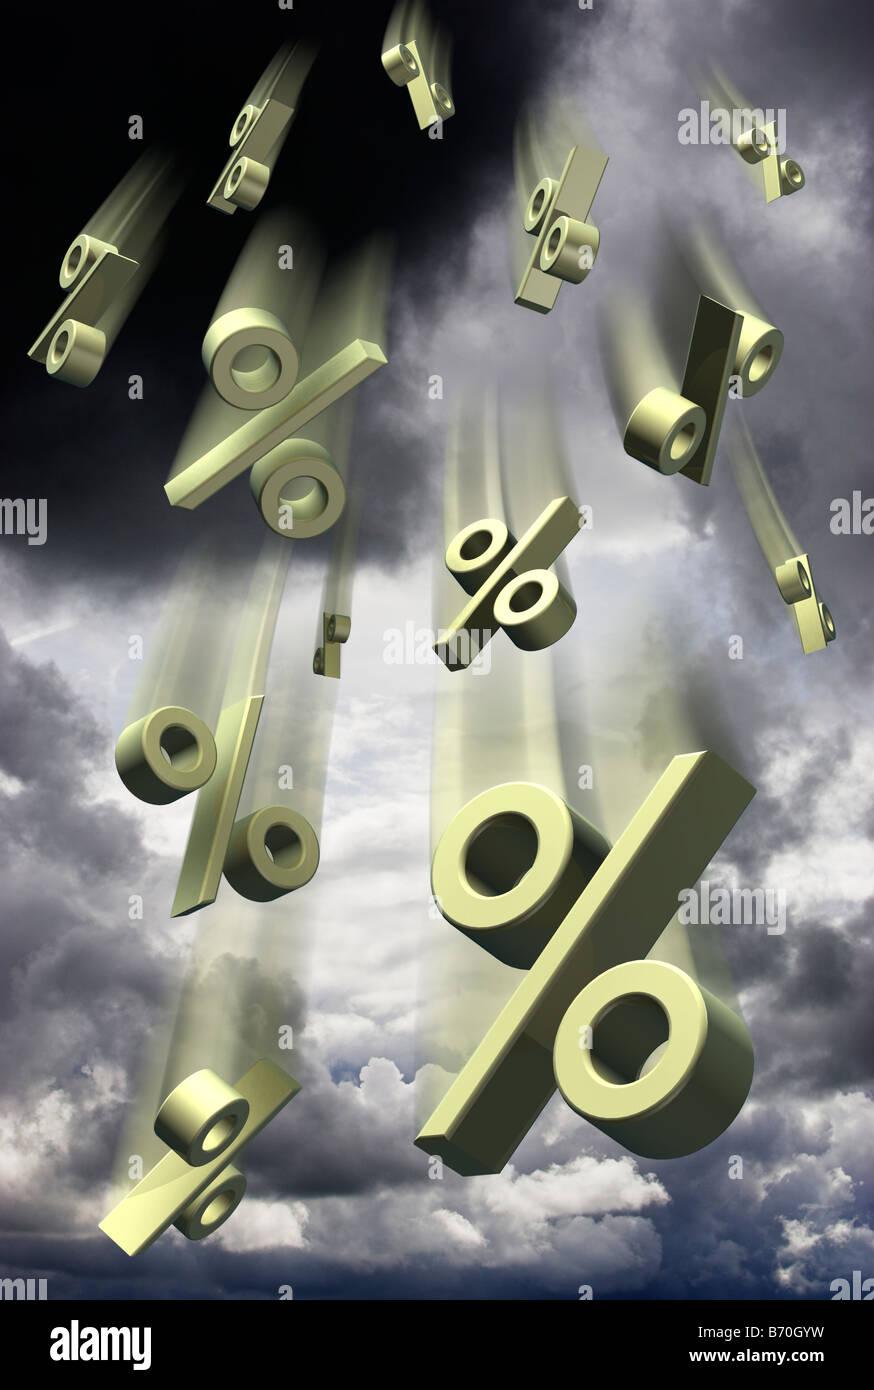 Interesse Prozentsatz Prozent bewerteten Symbole fallen gegen einen stürmischen Himmel - digital composite Stockbild